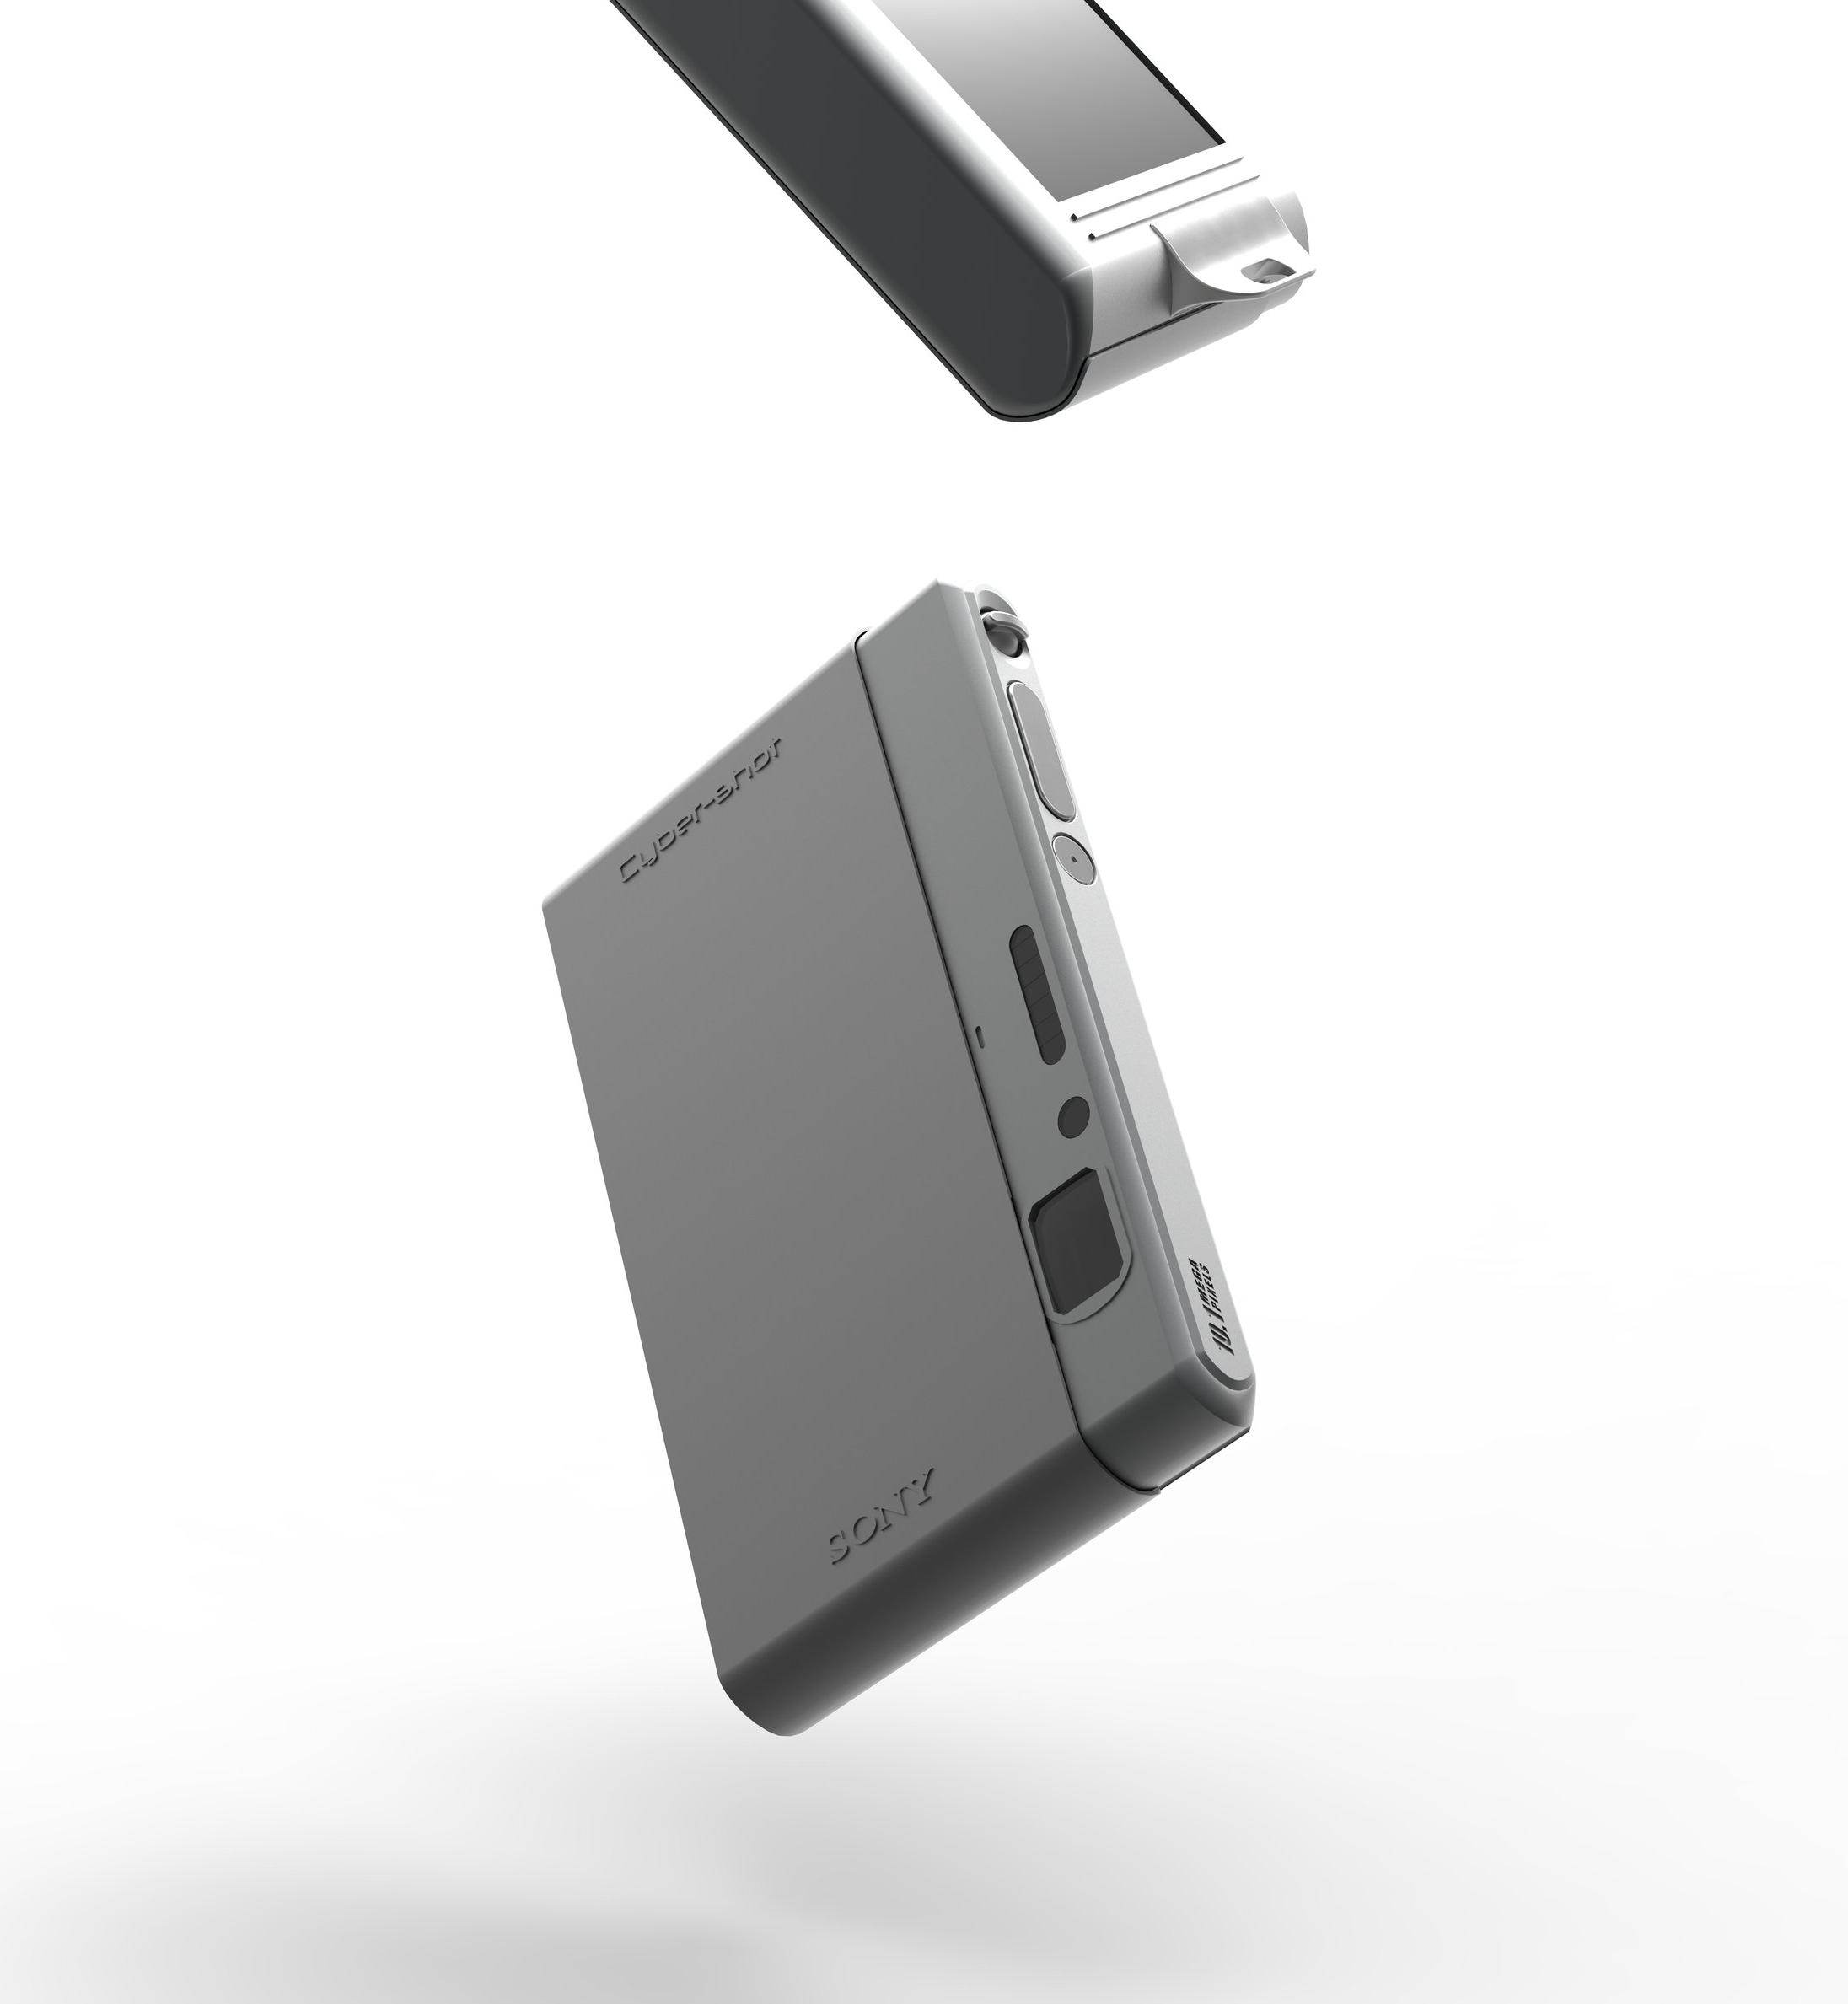 Rendering of Sony Cyborshot DSC-T77 /   Solidworks, Keyshot